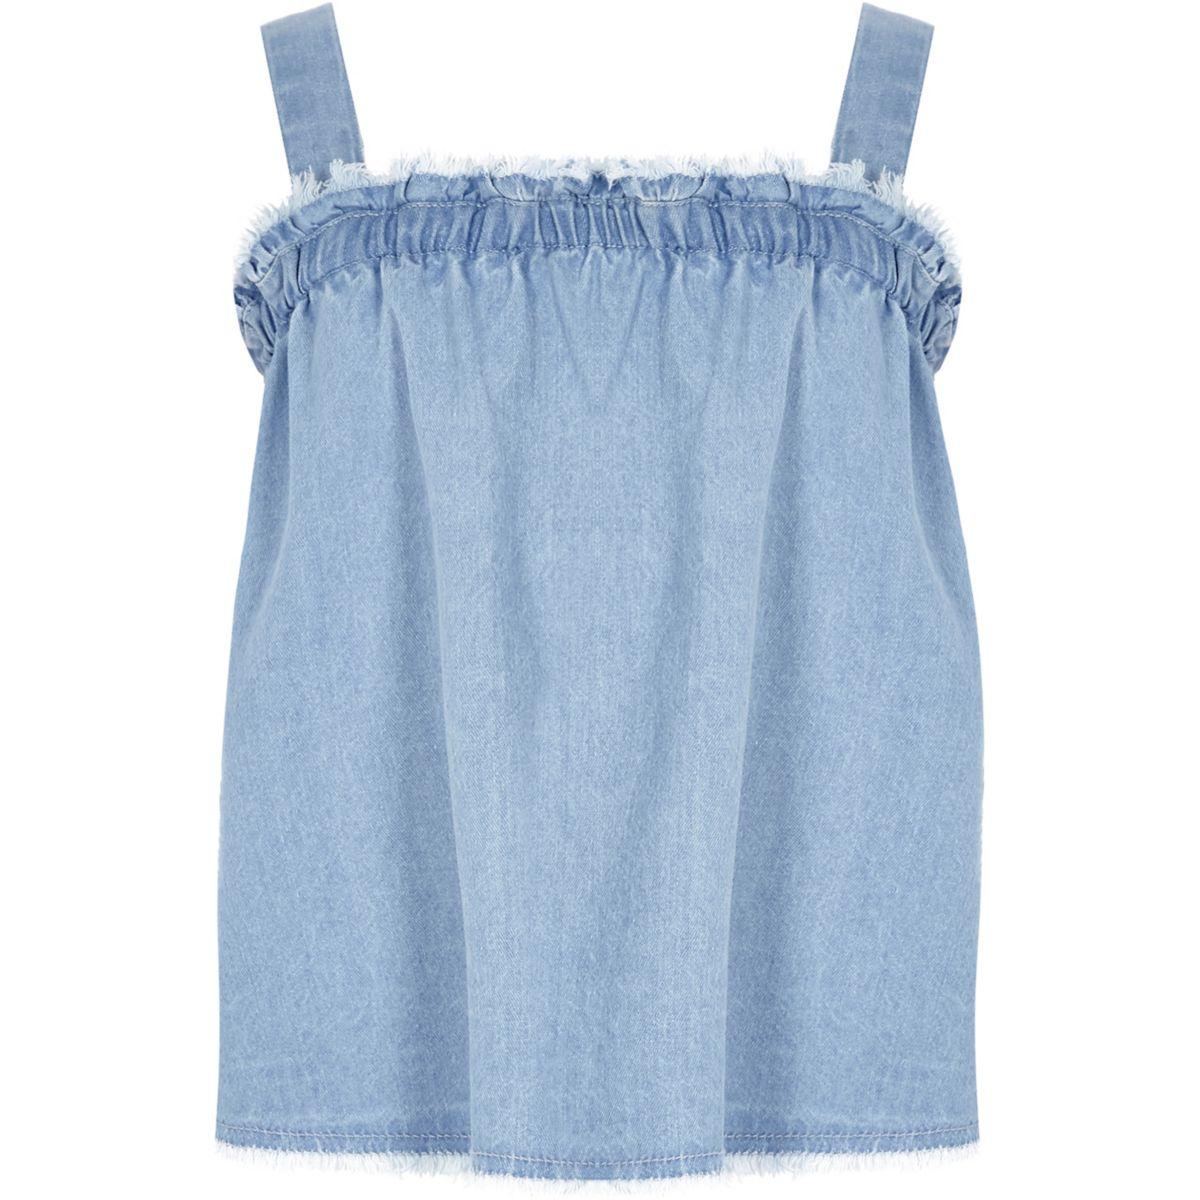 Girls denim shirred neck cami top